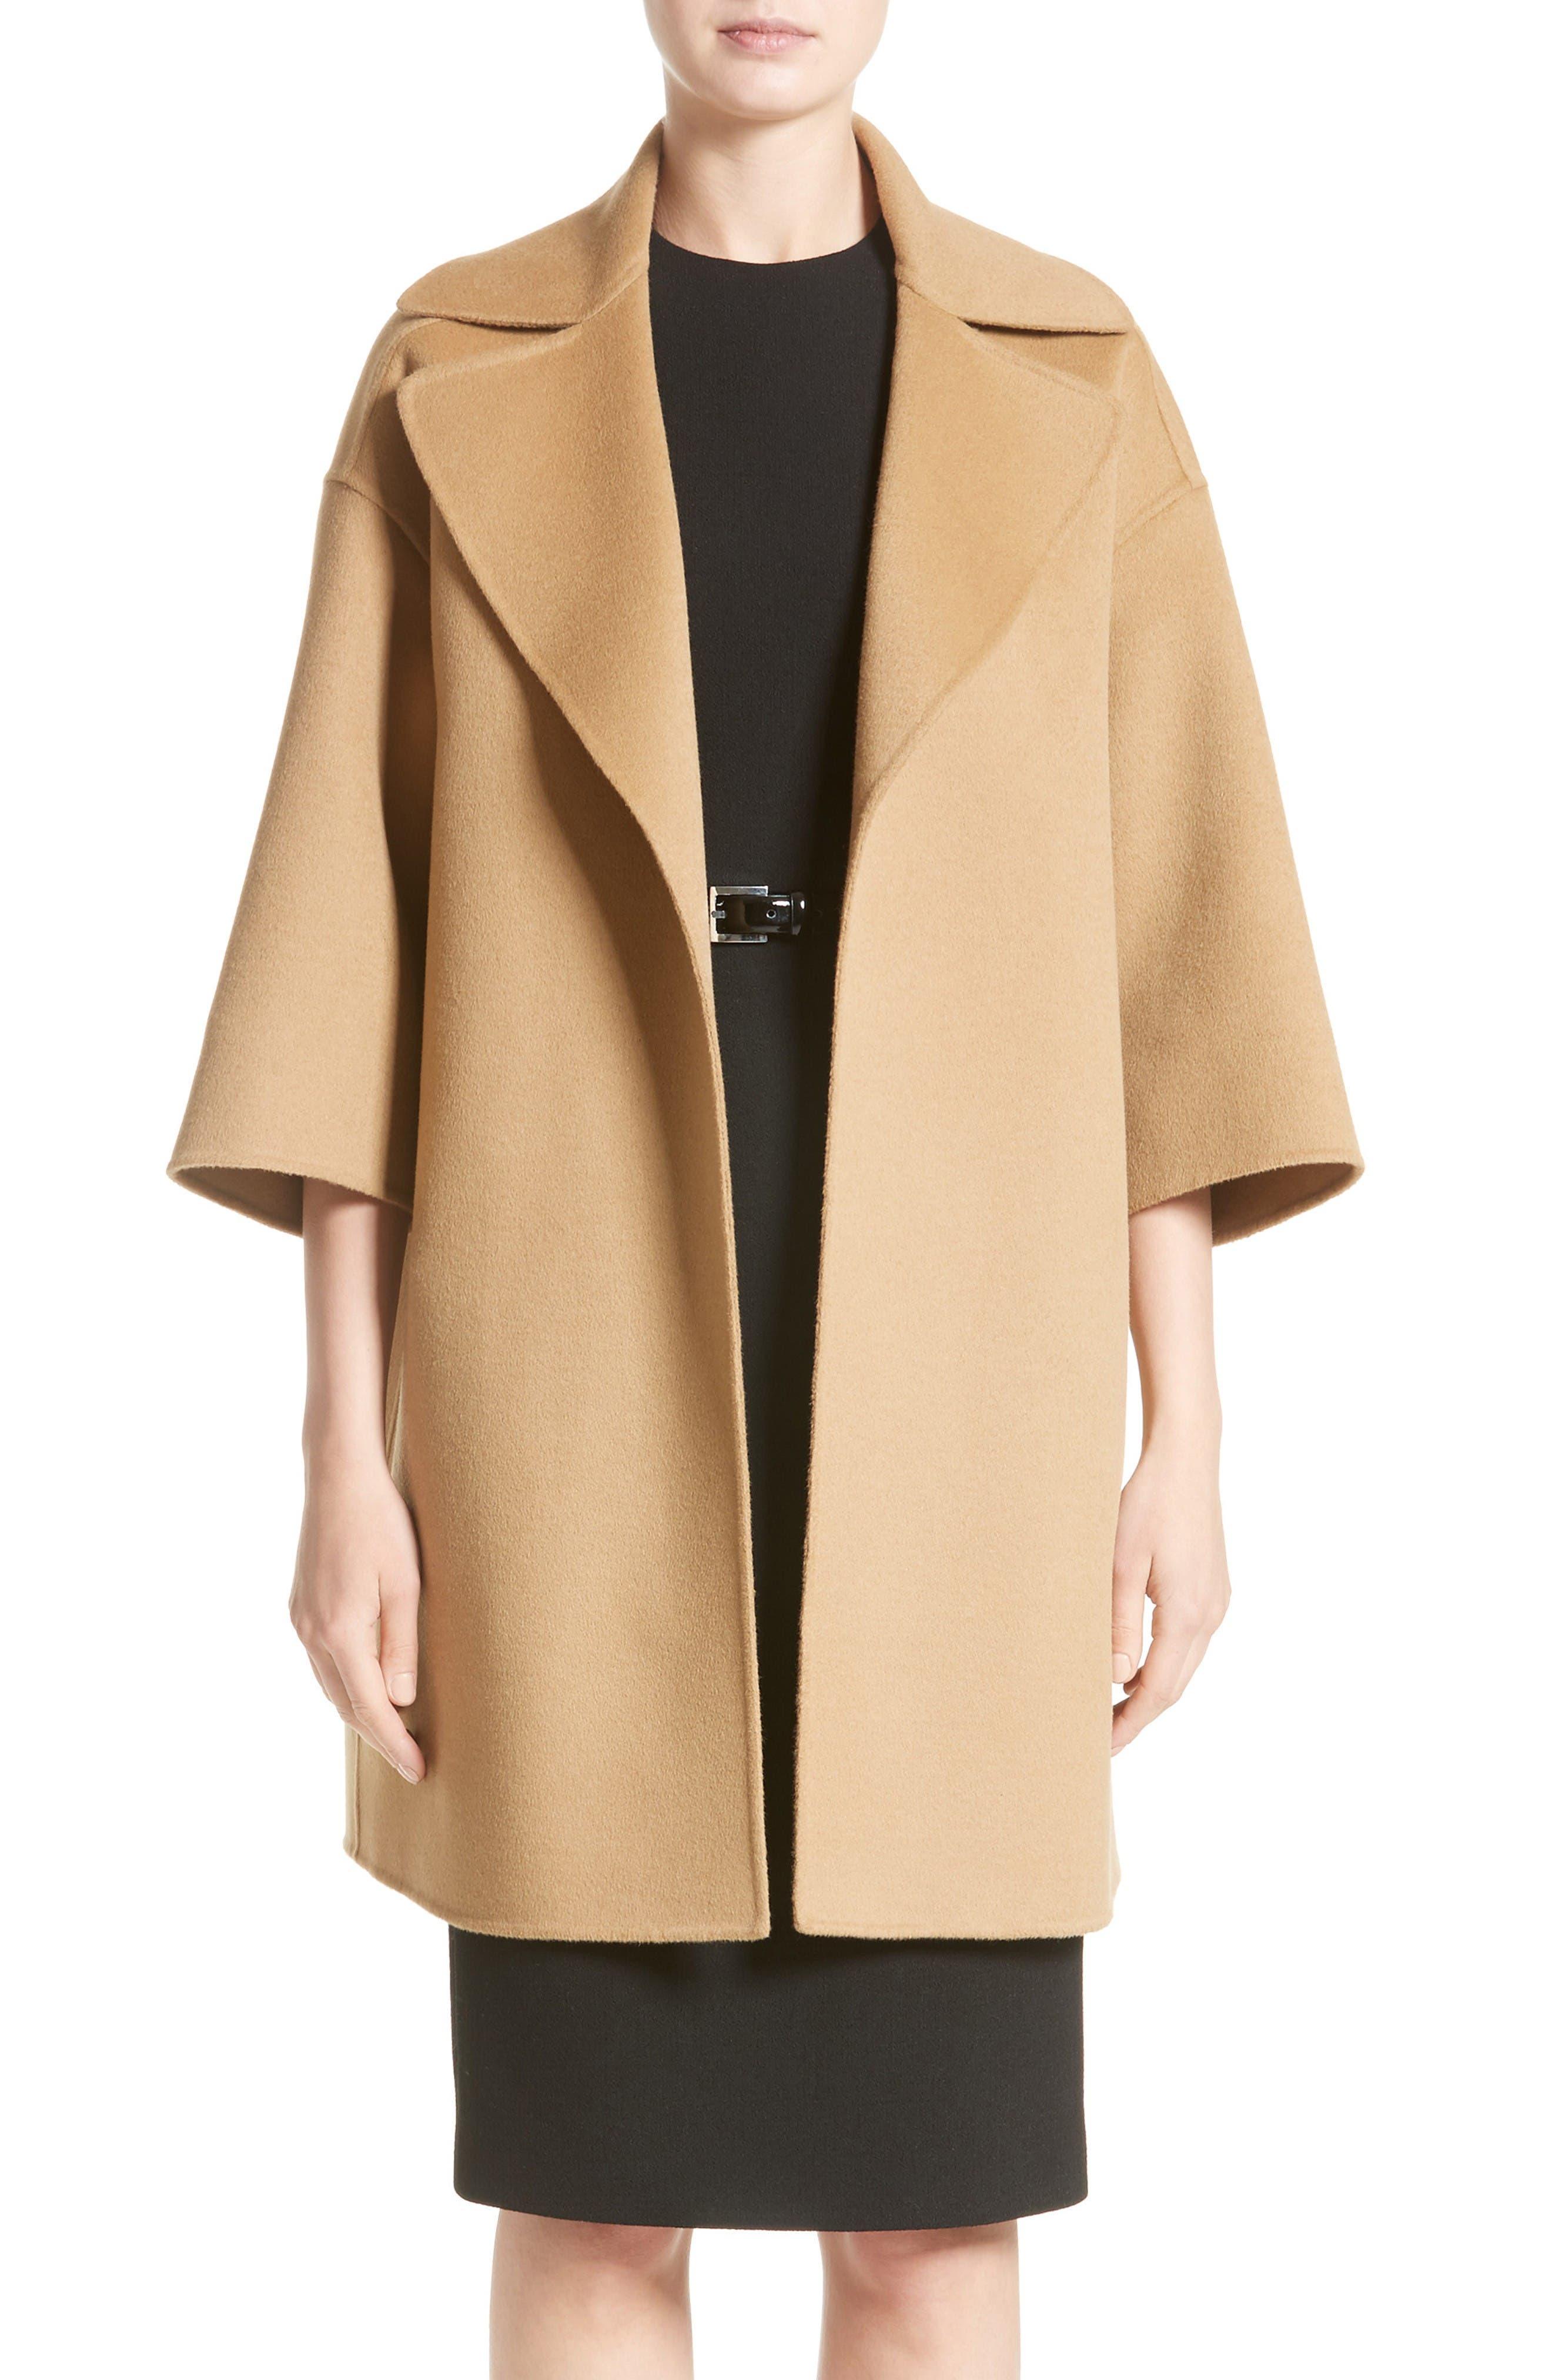 Alternate Image 1 Selected - Michael Kors Wool Blend Coat